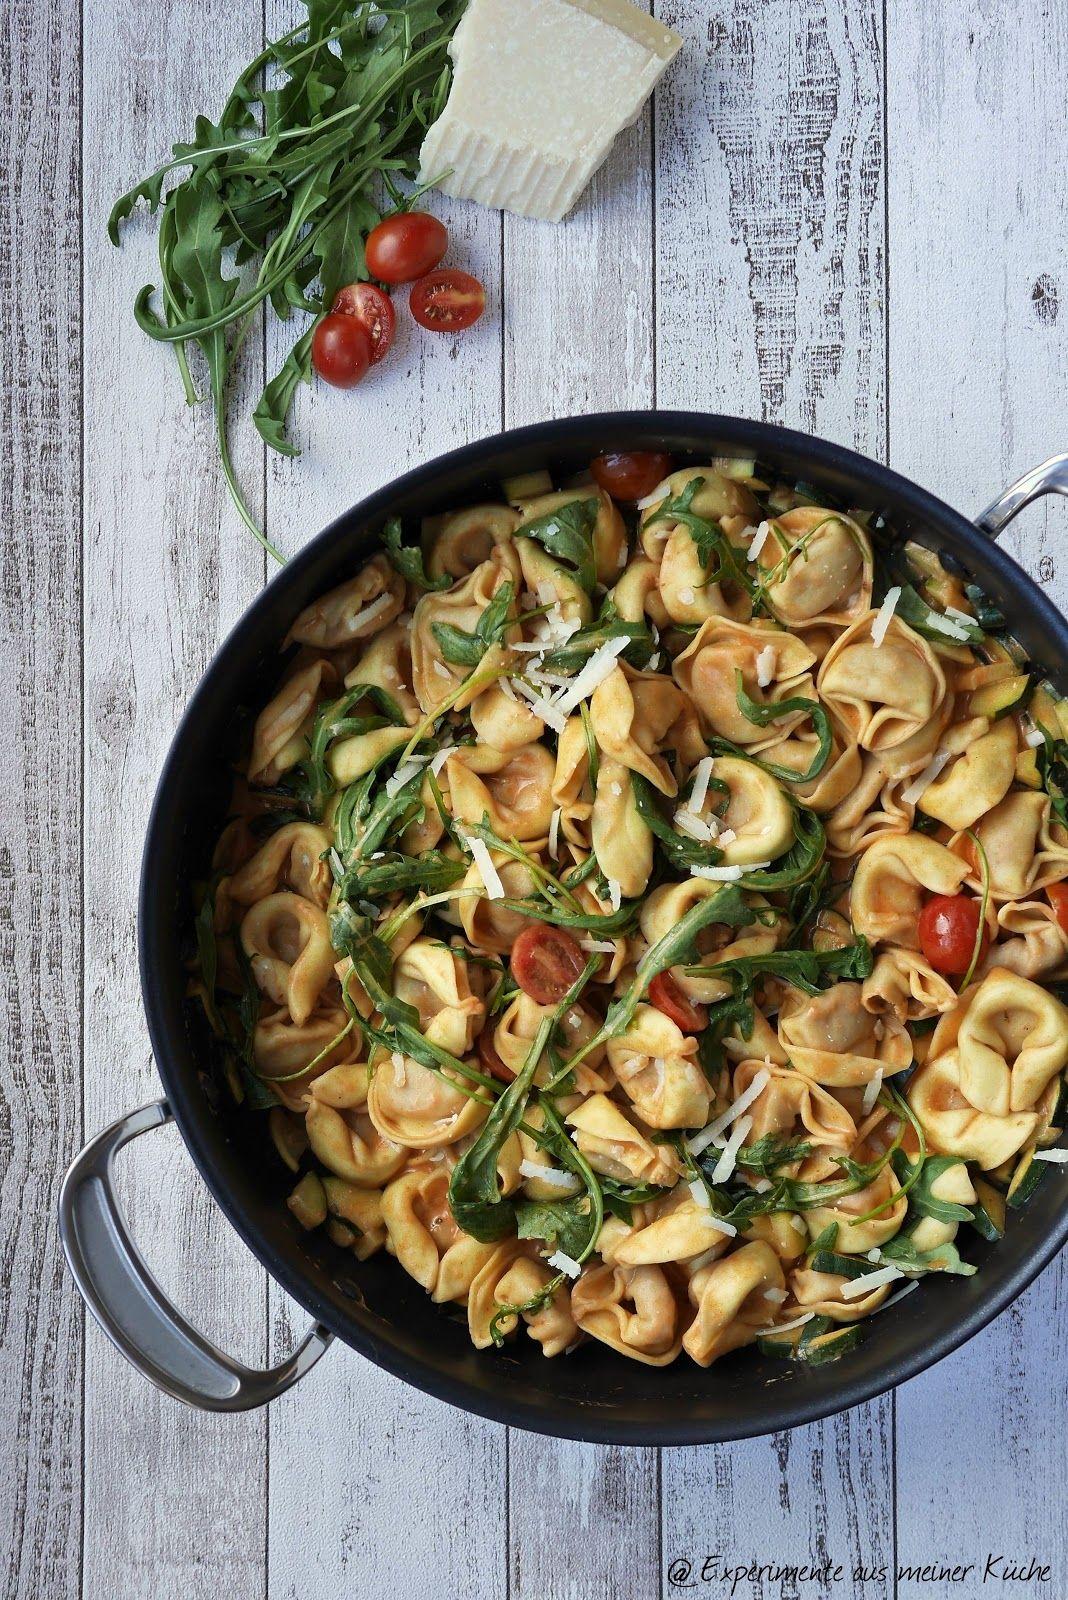 Tortelloni-Zucchini-Pfanne   Auberginauflauf   Pinterest   Zucchini ...